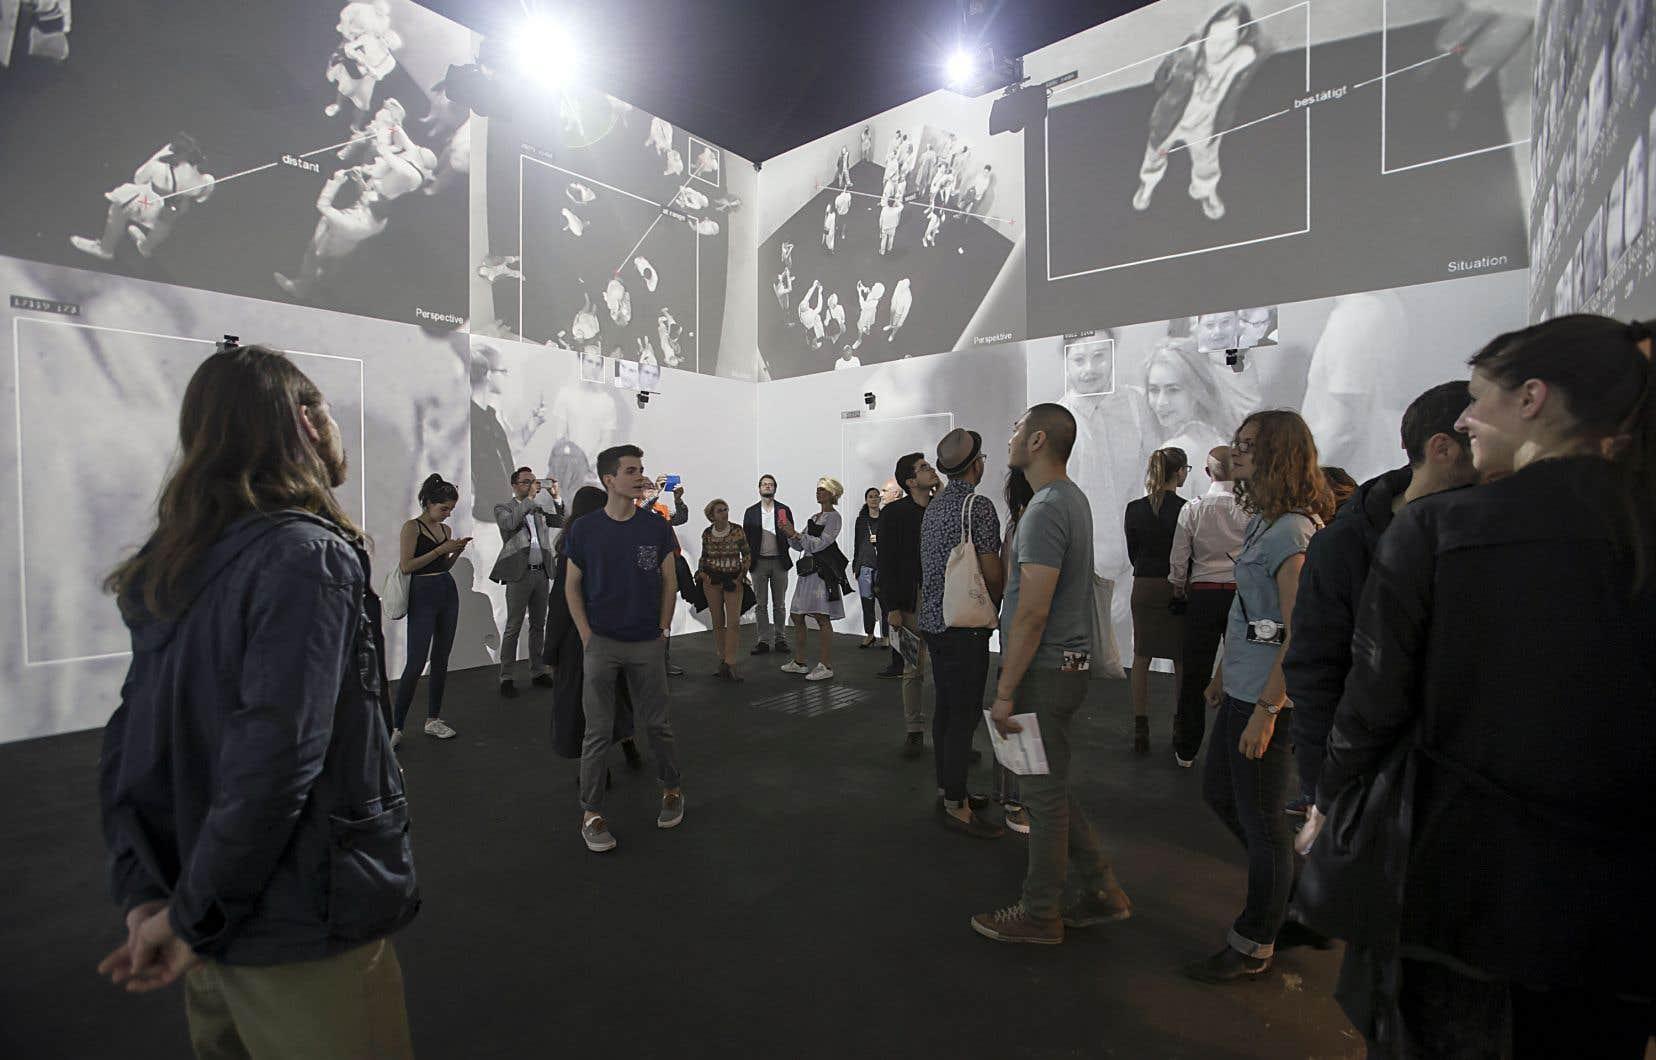 Rafael Lozano-Hemmer (en collaboration avec Krzysztof Wodiczko), «Zoom Pavilion», 2015. Vue de l'installation au Art Basel Unlimited – Art Basel 47, à Bâle, en Suisse.